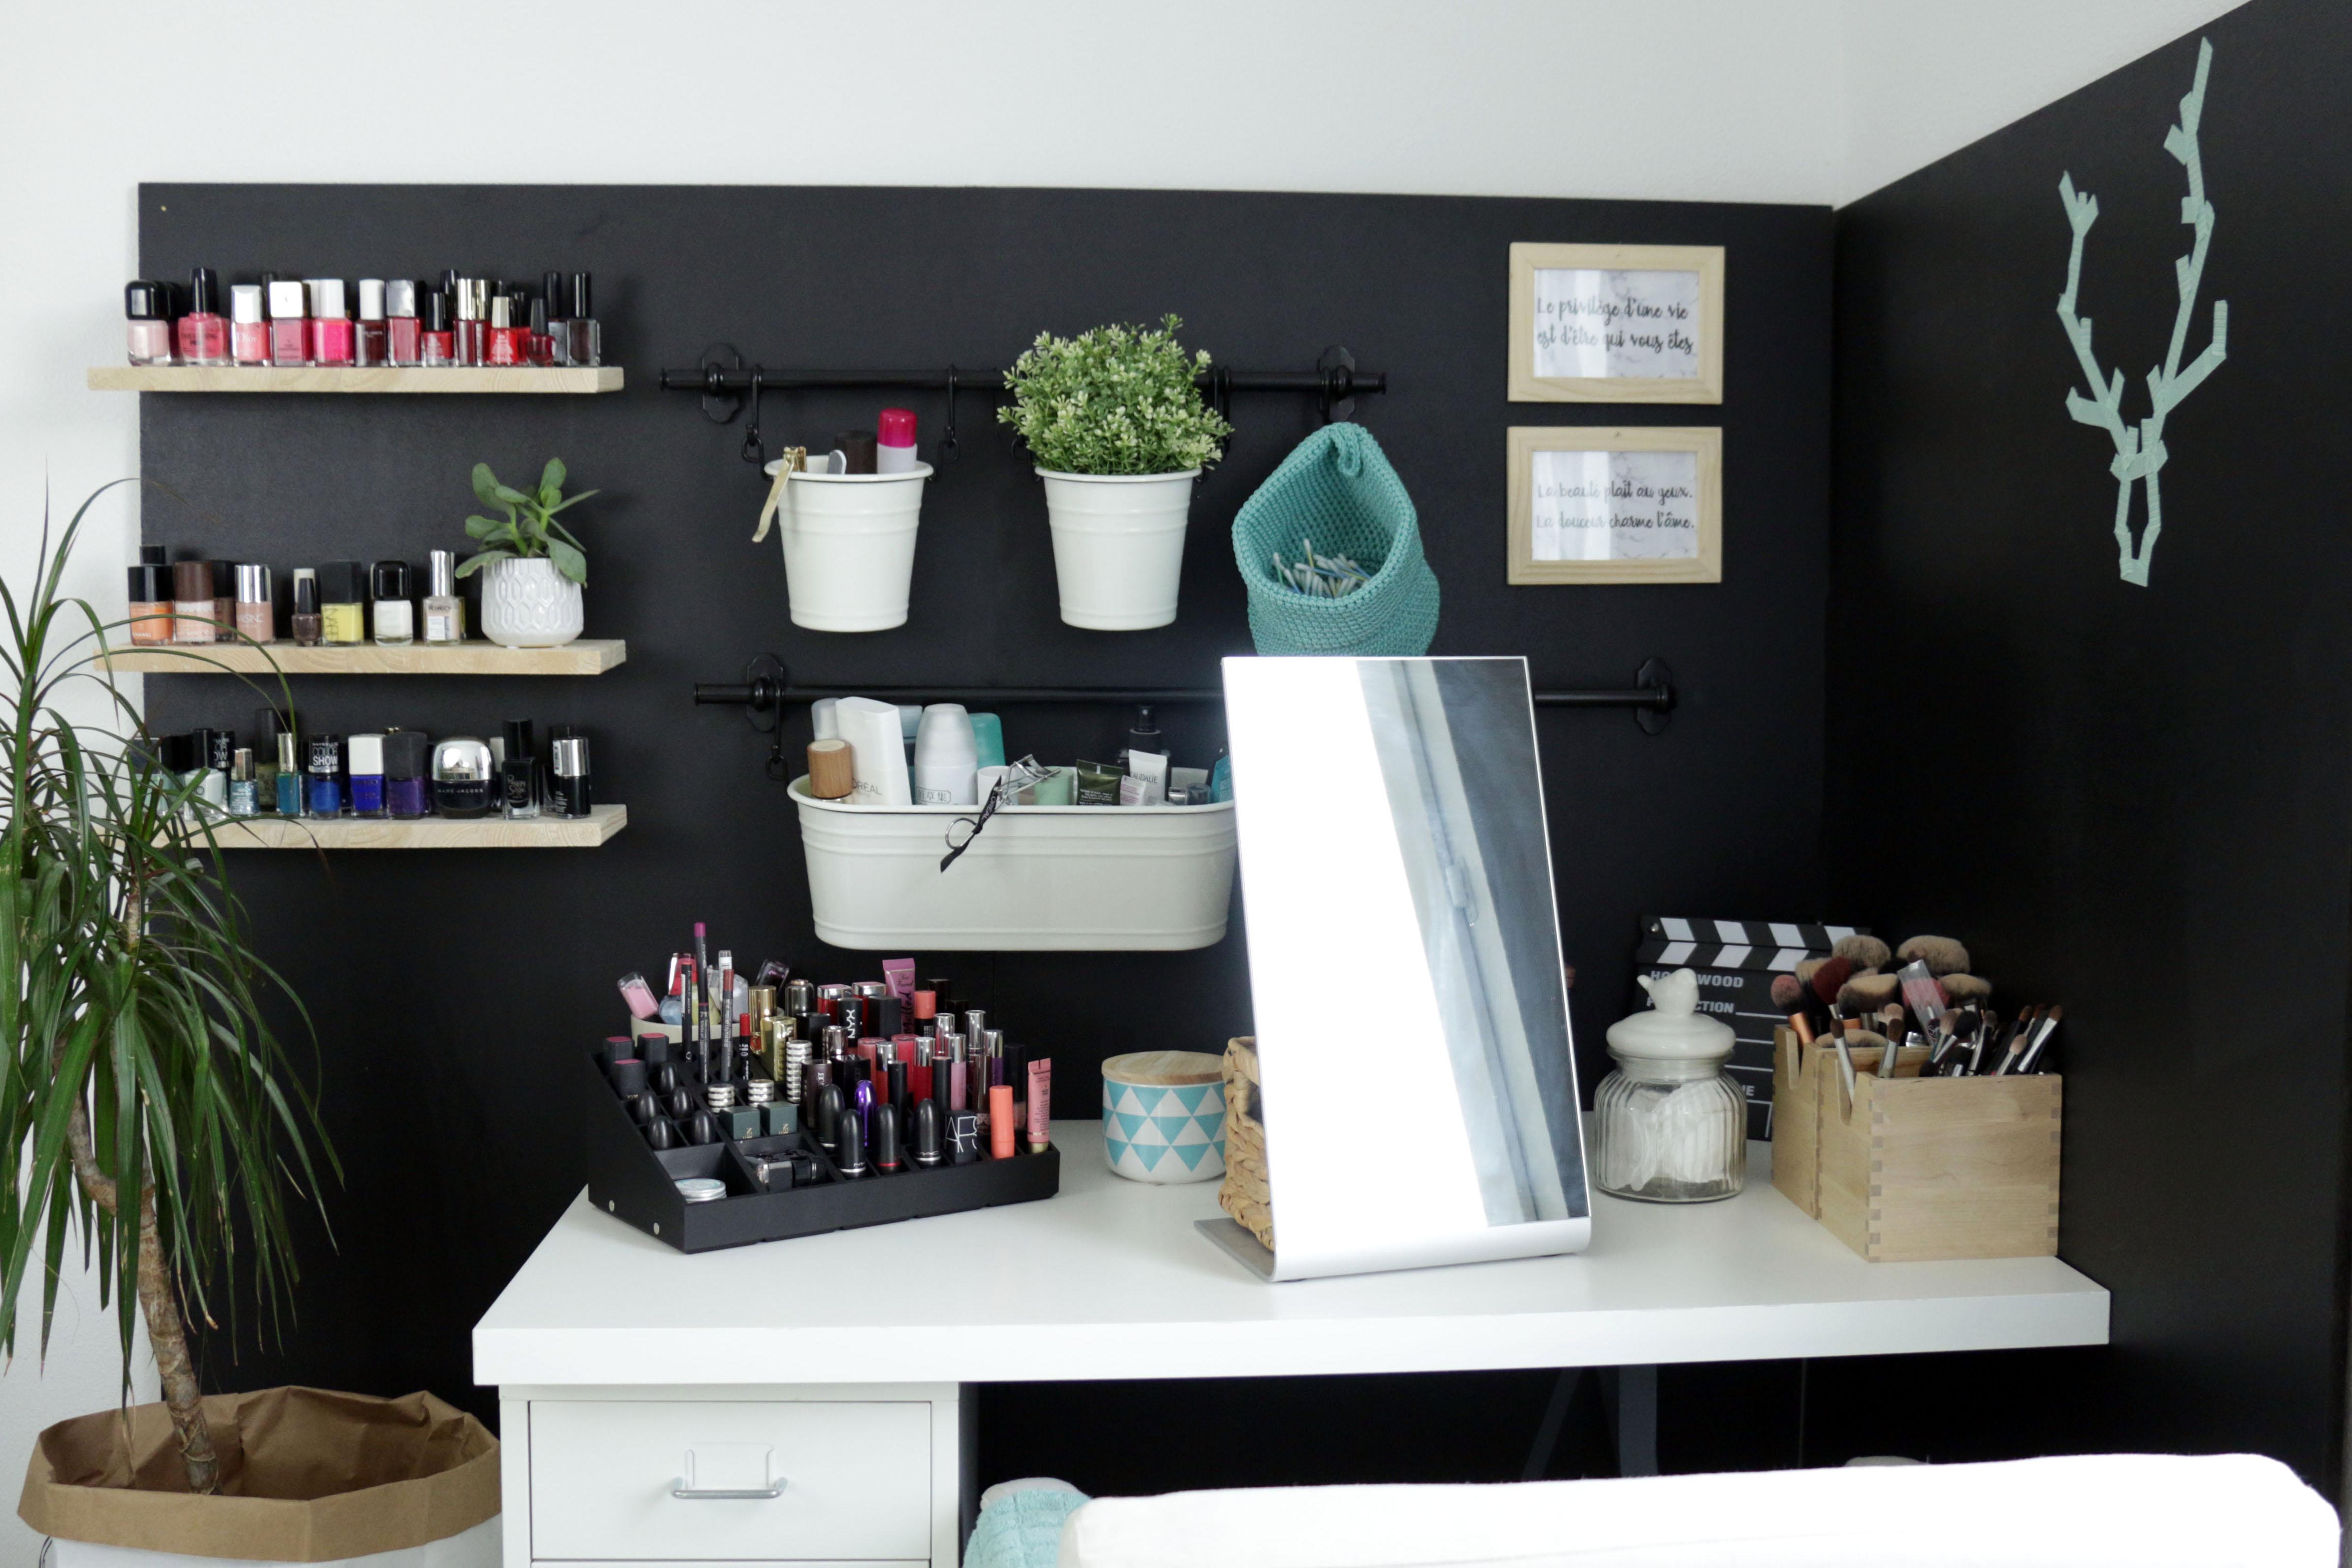 mon rangement maquillage twos. Black Bedroom Furniture Sets. Home Design Ideas